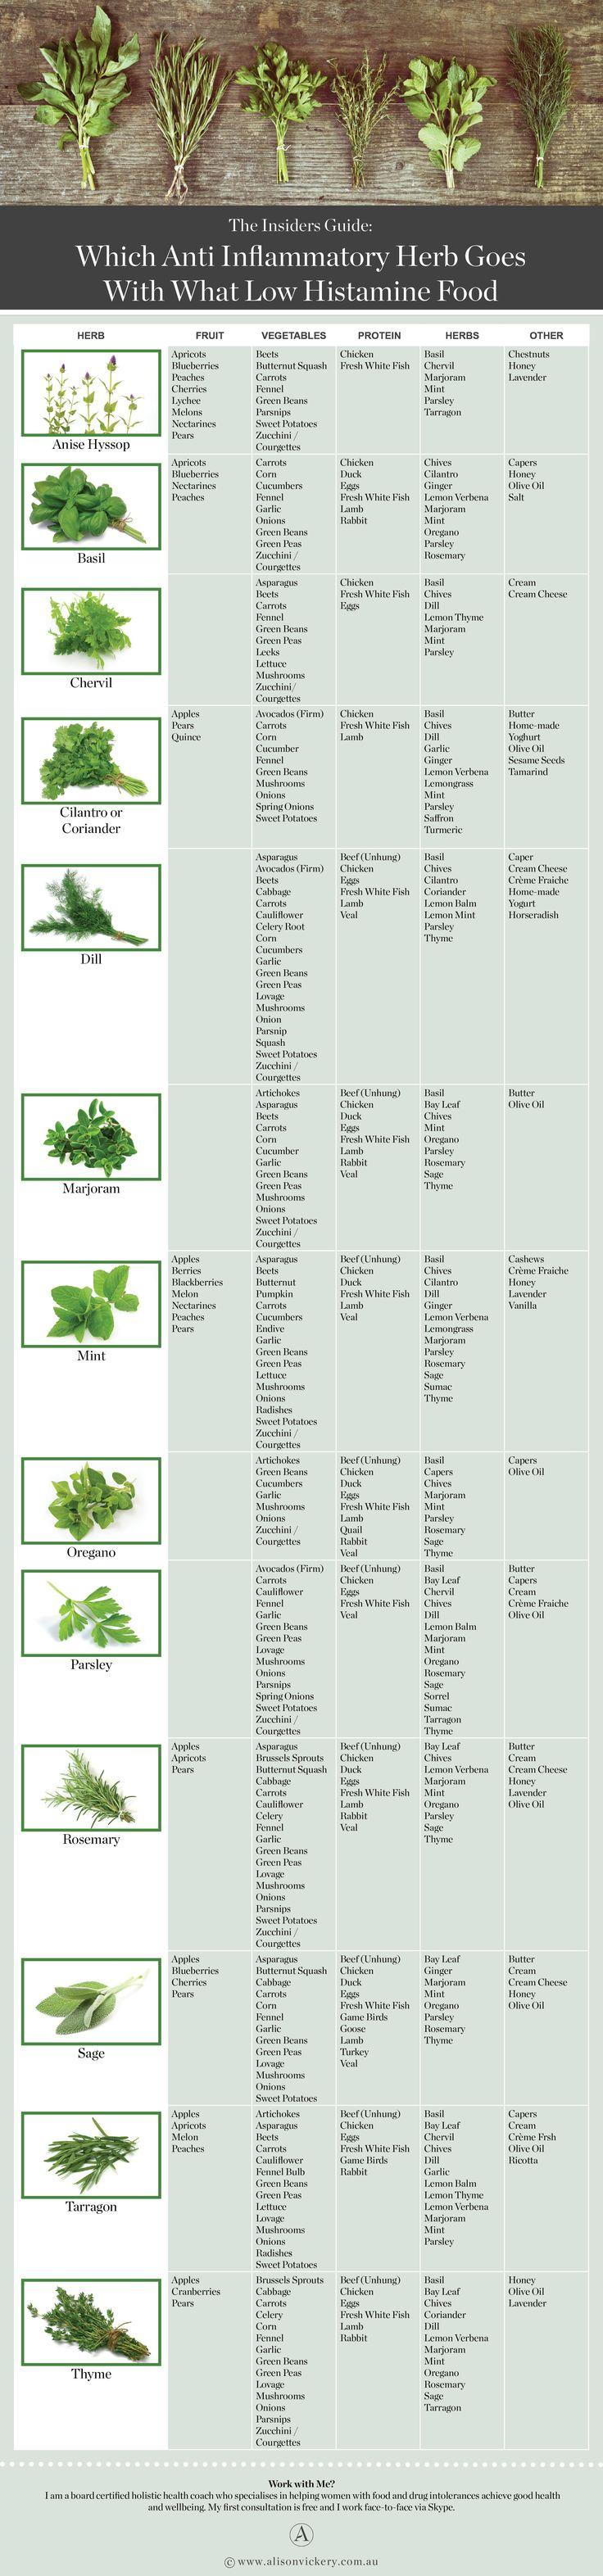 anti inflammatory herbs alison vickery